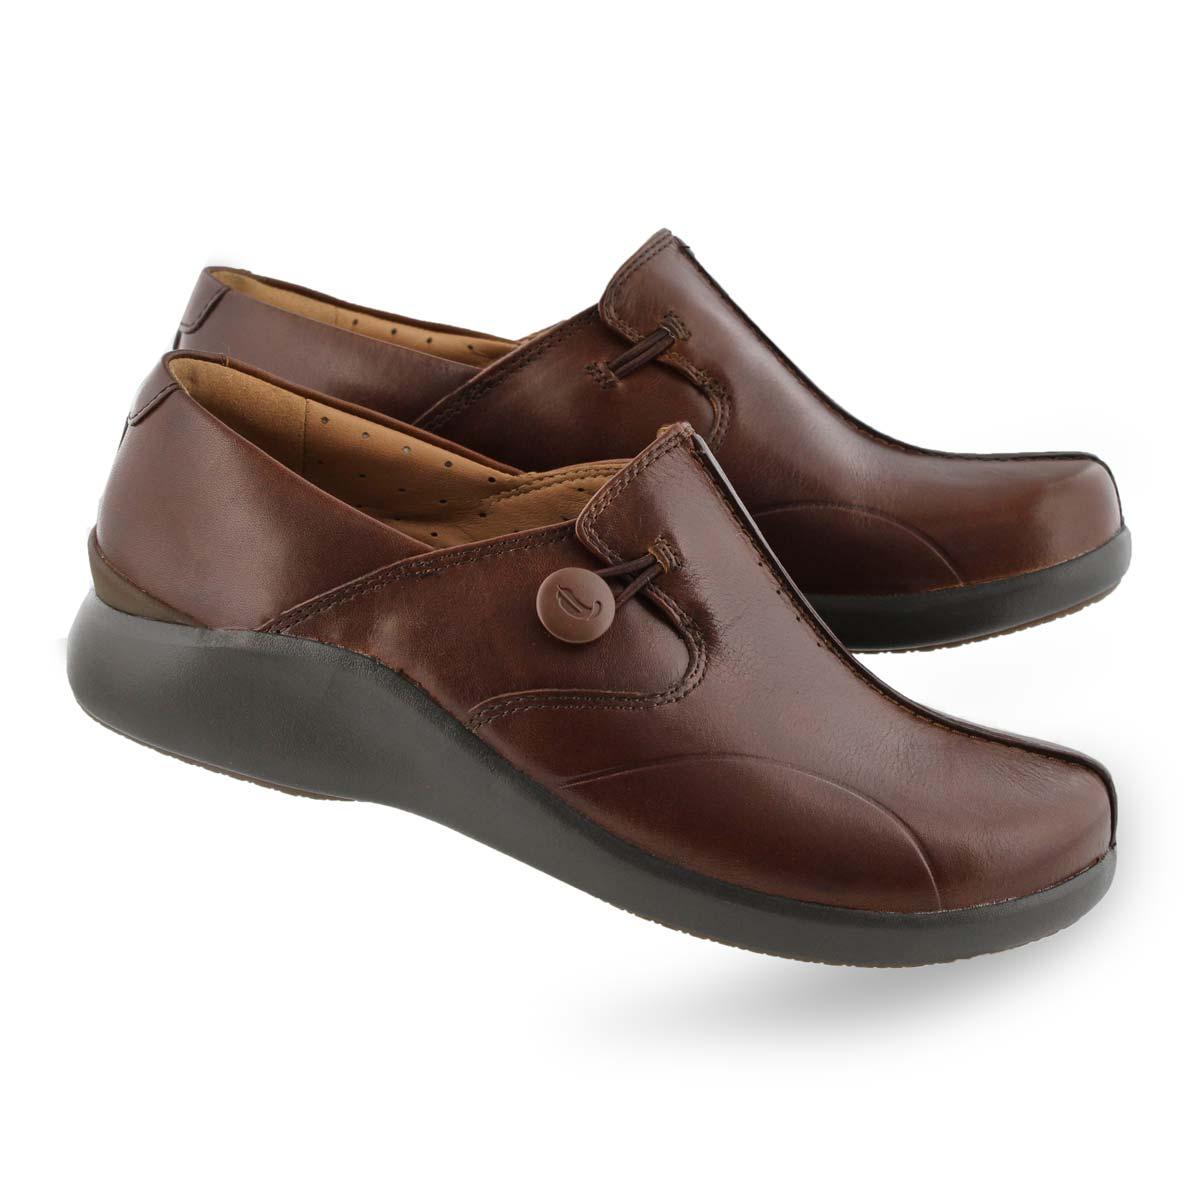 Women's UNLOOP 2 WALK dark tan casual shoes - Wide